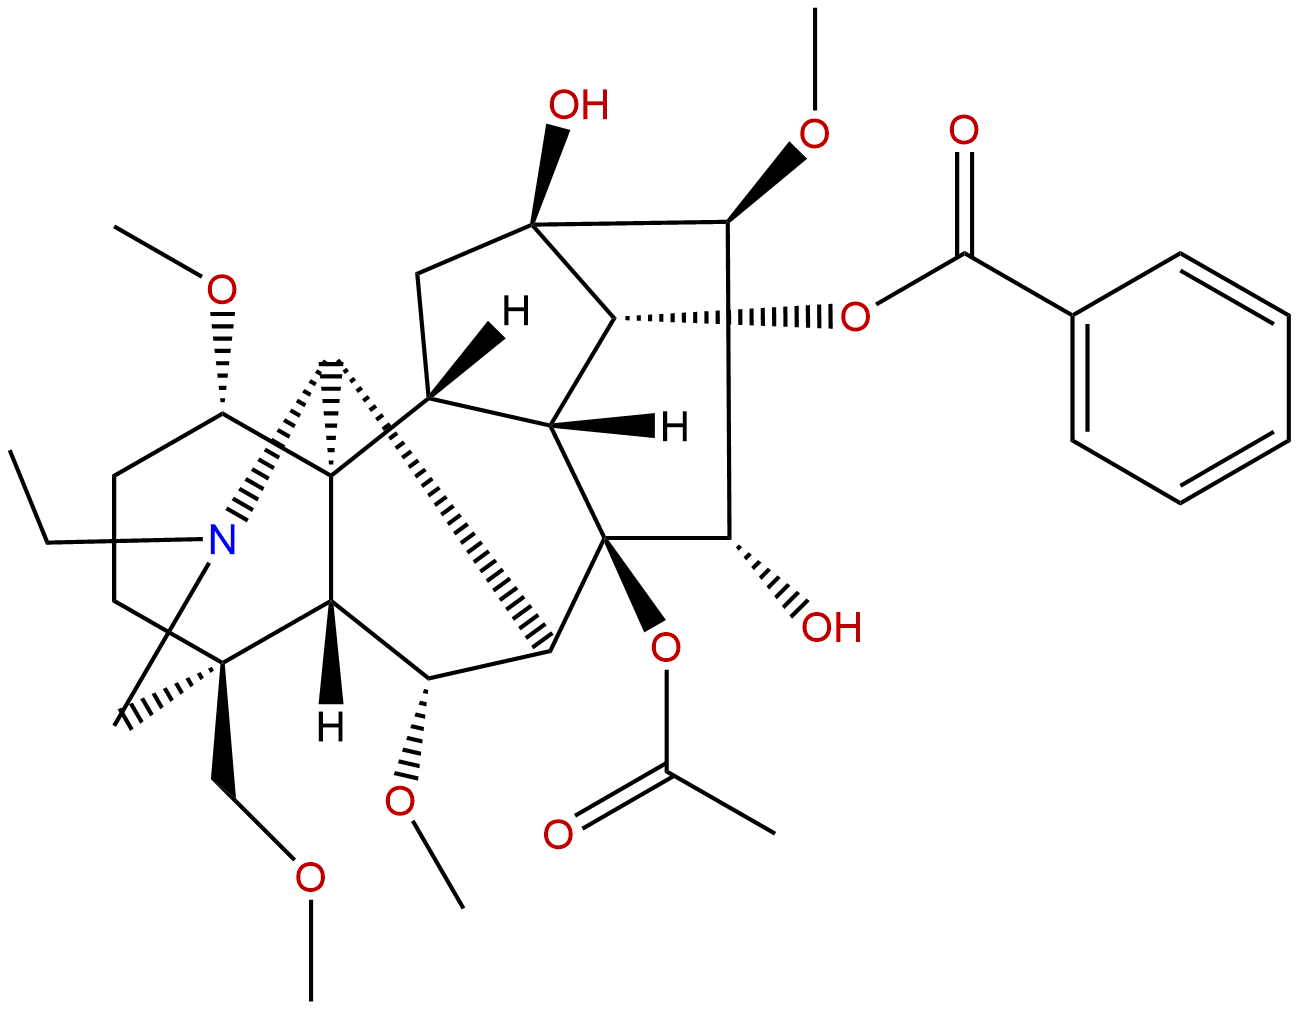 3-Deoxyaconitine